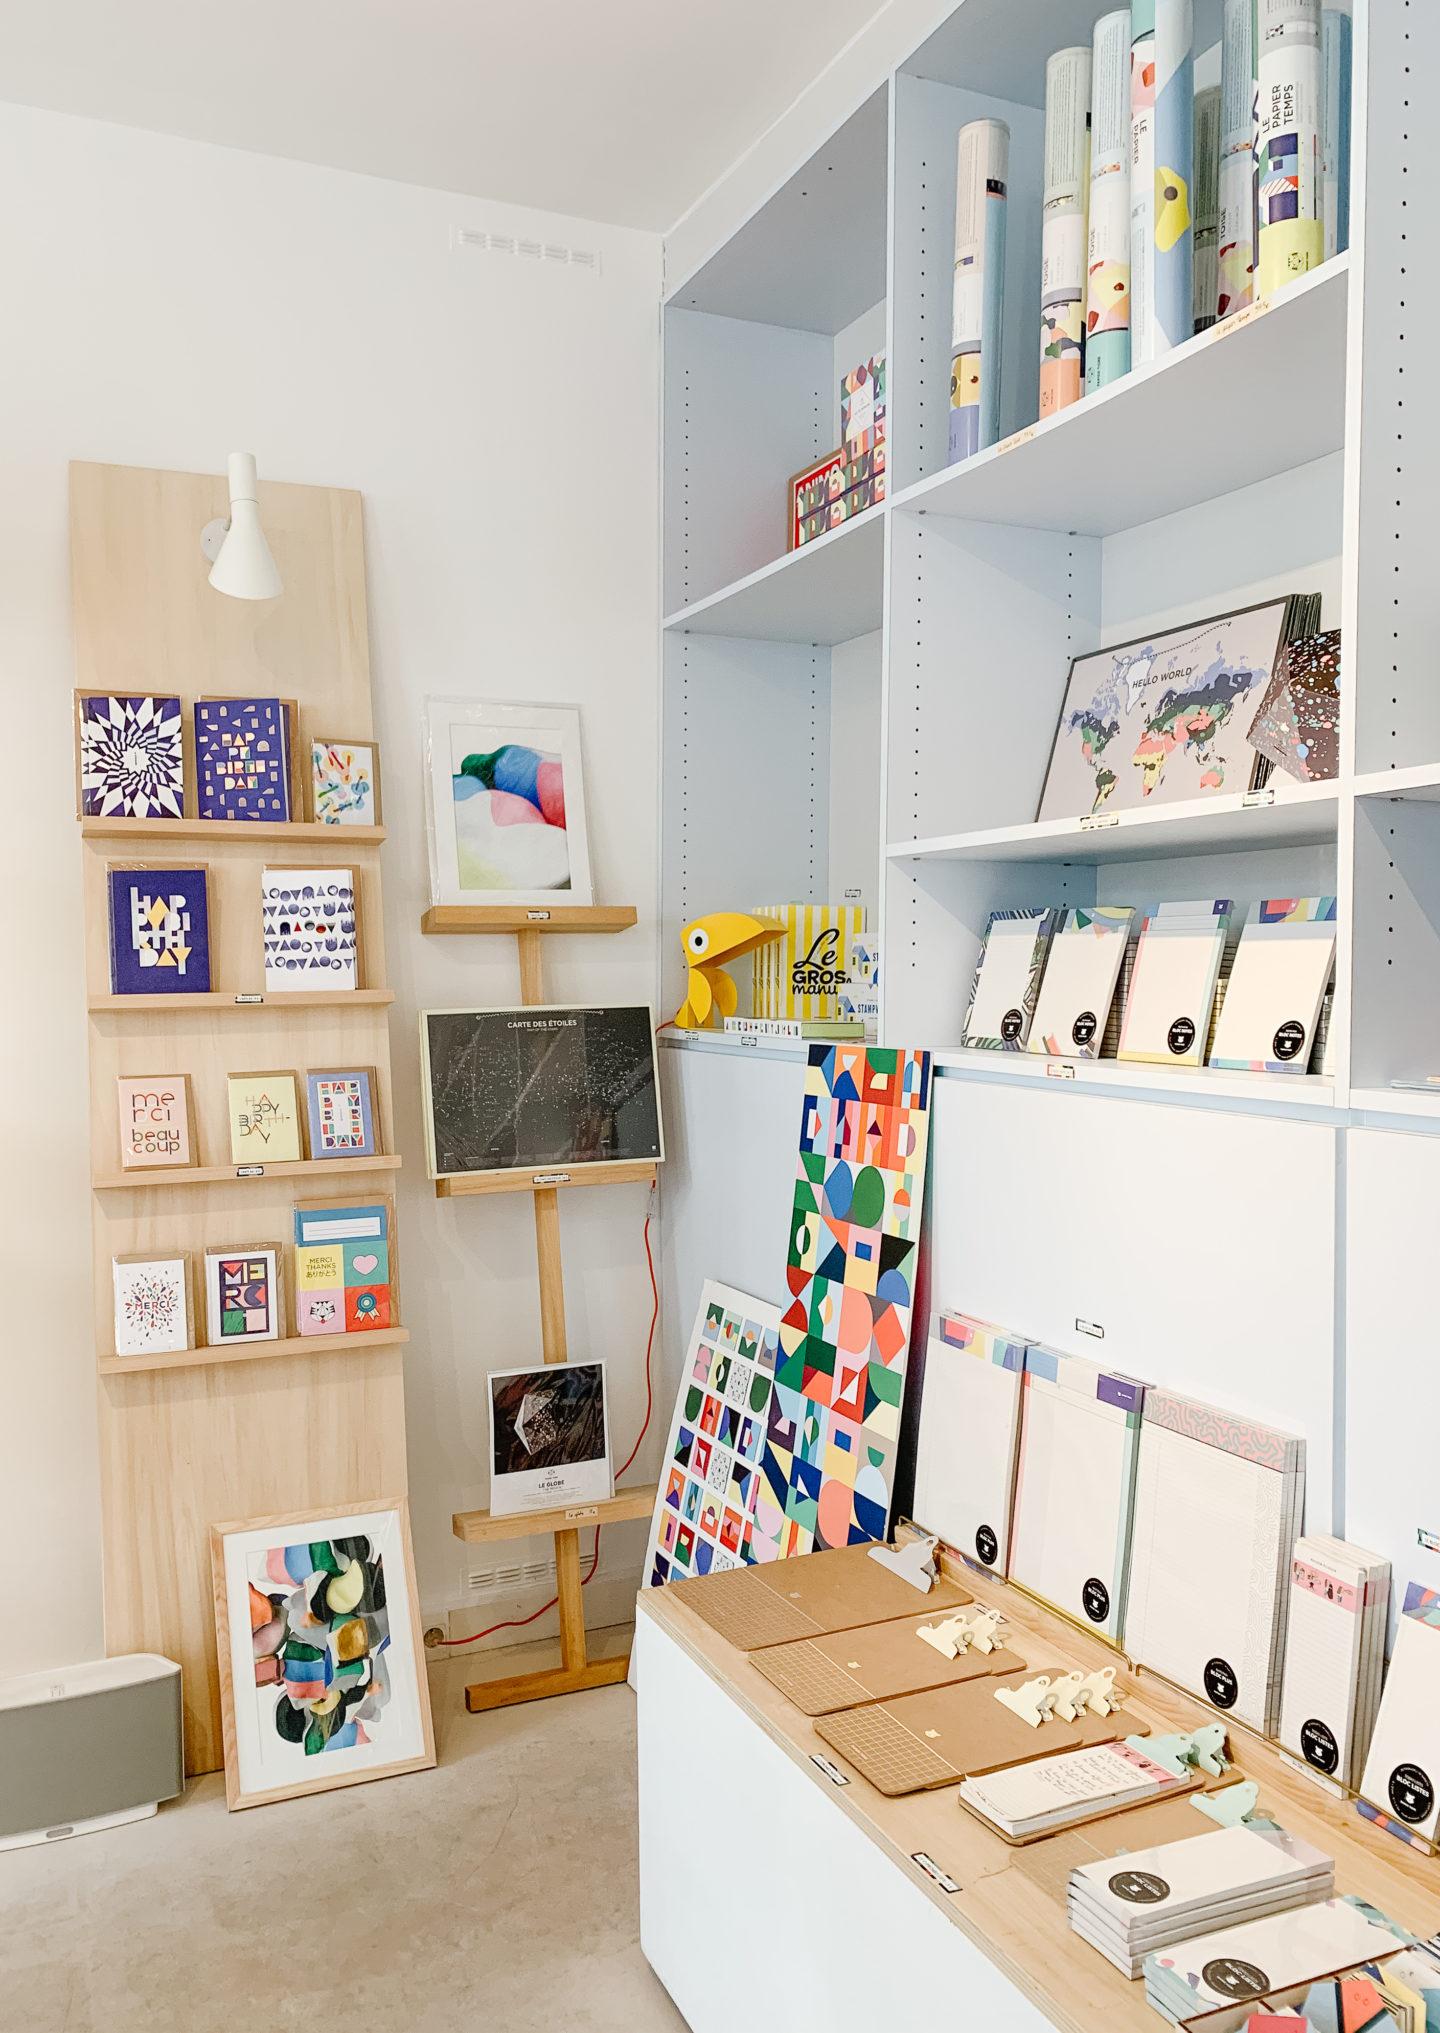 Best design shops in paris